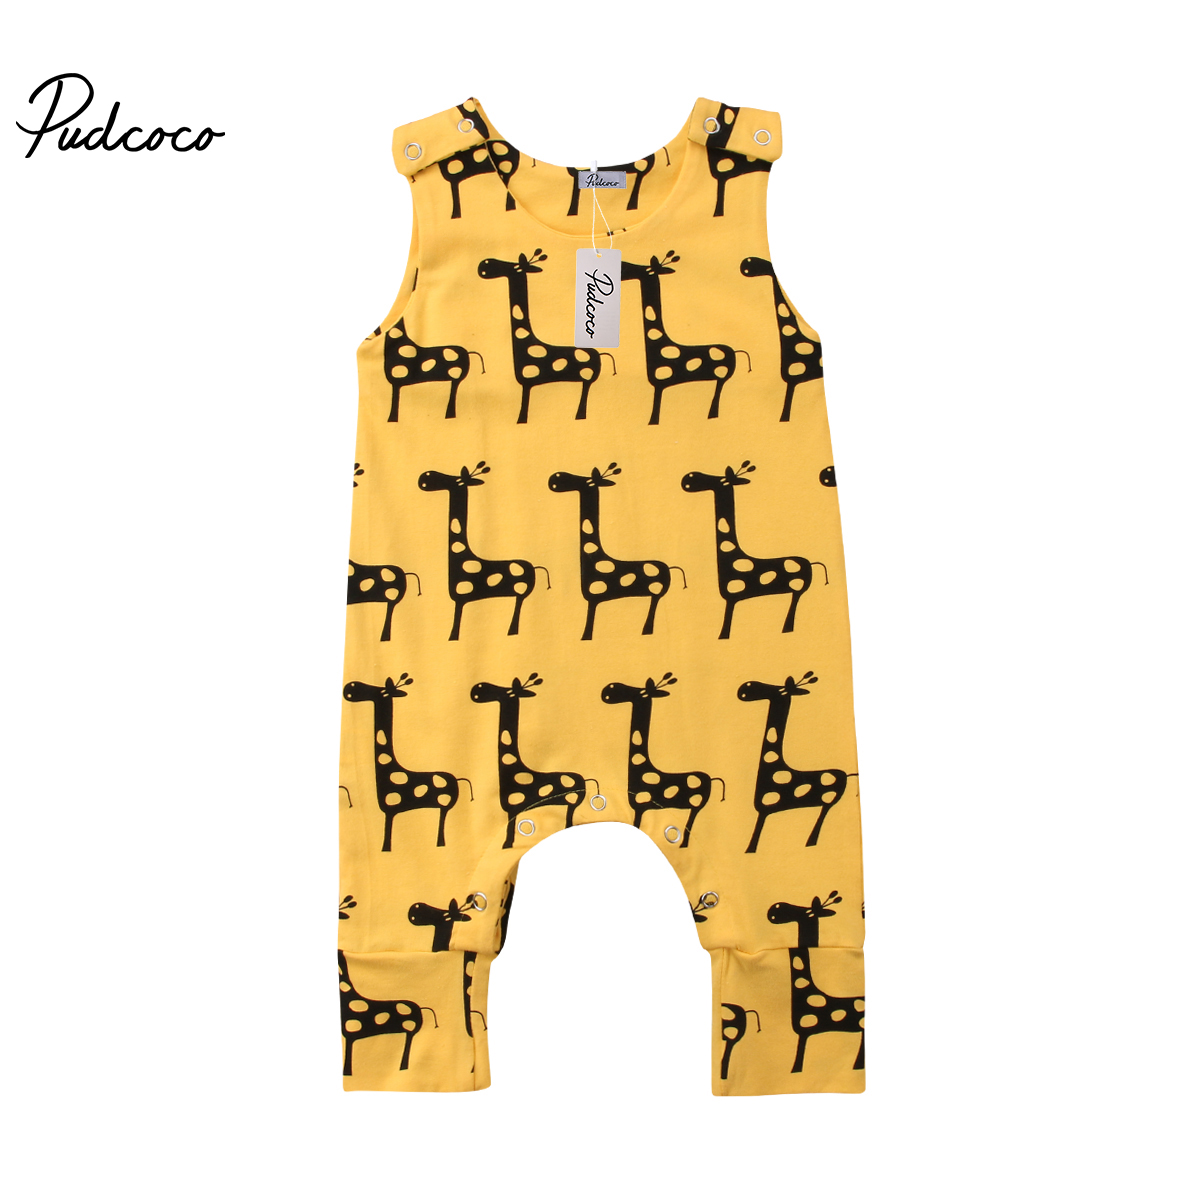 Newborn Infant Baby Boy Girl Cartoon Romper Summer Toddler Sleeveless Jumpsuit Sunsuit